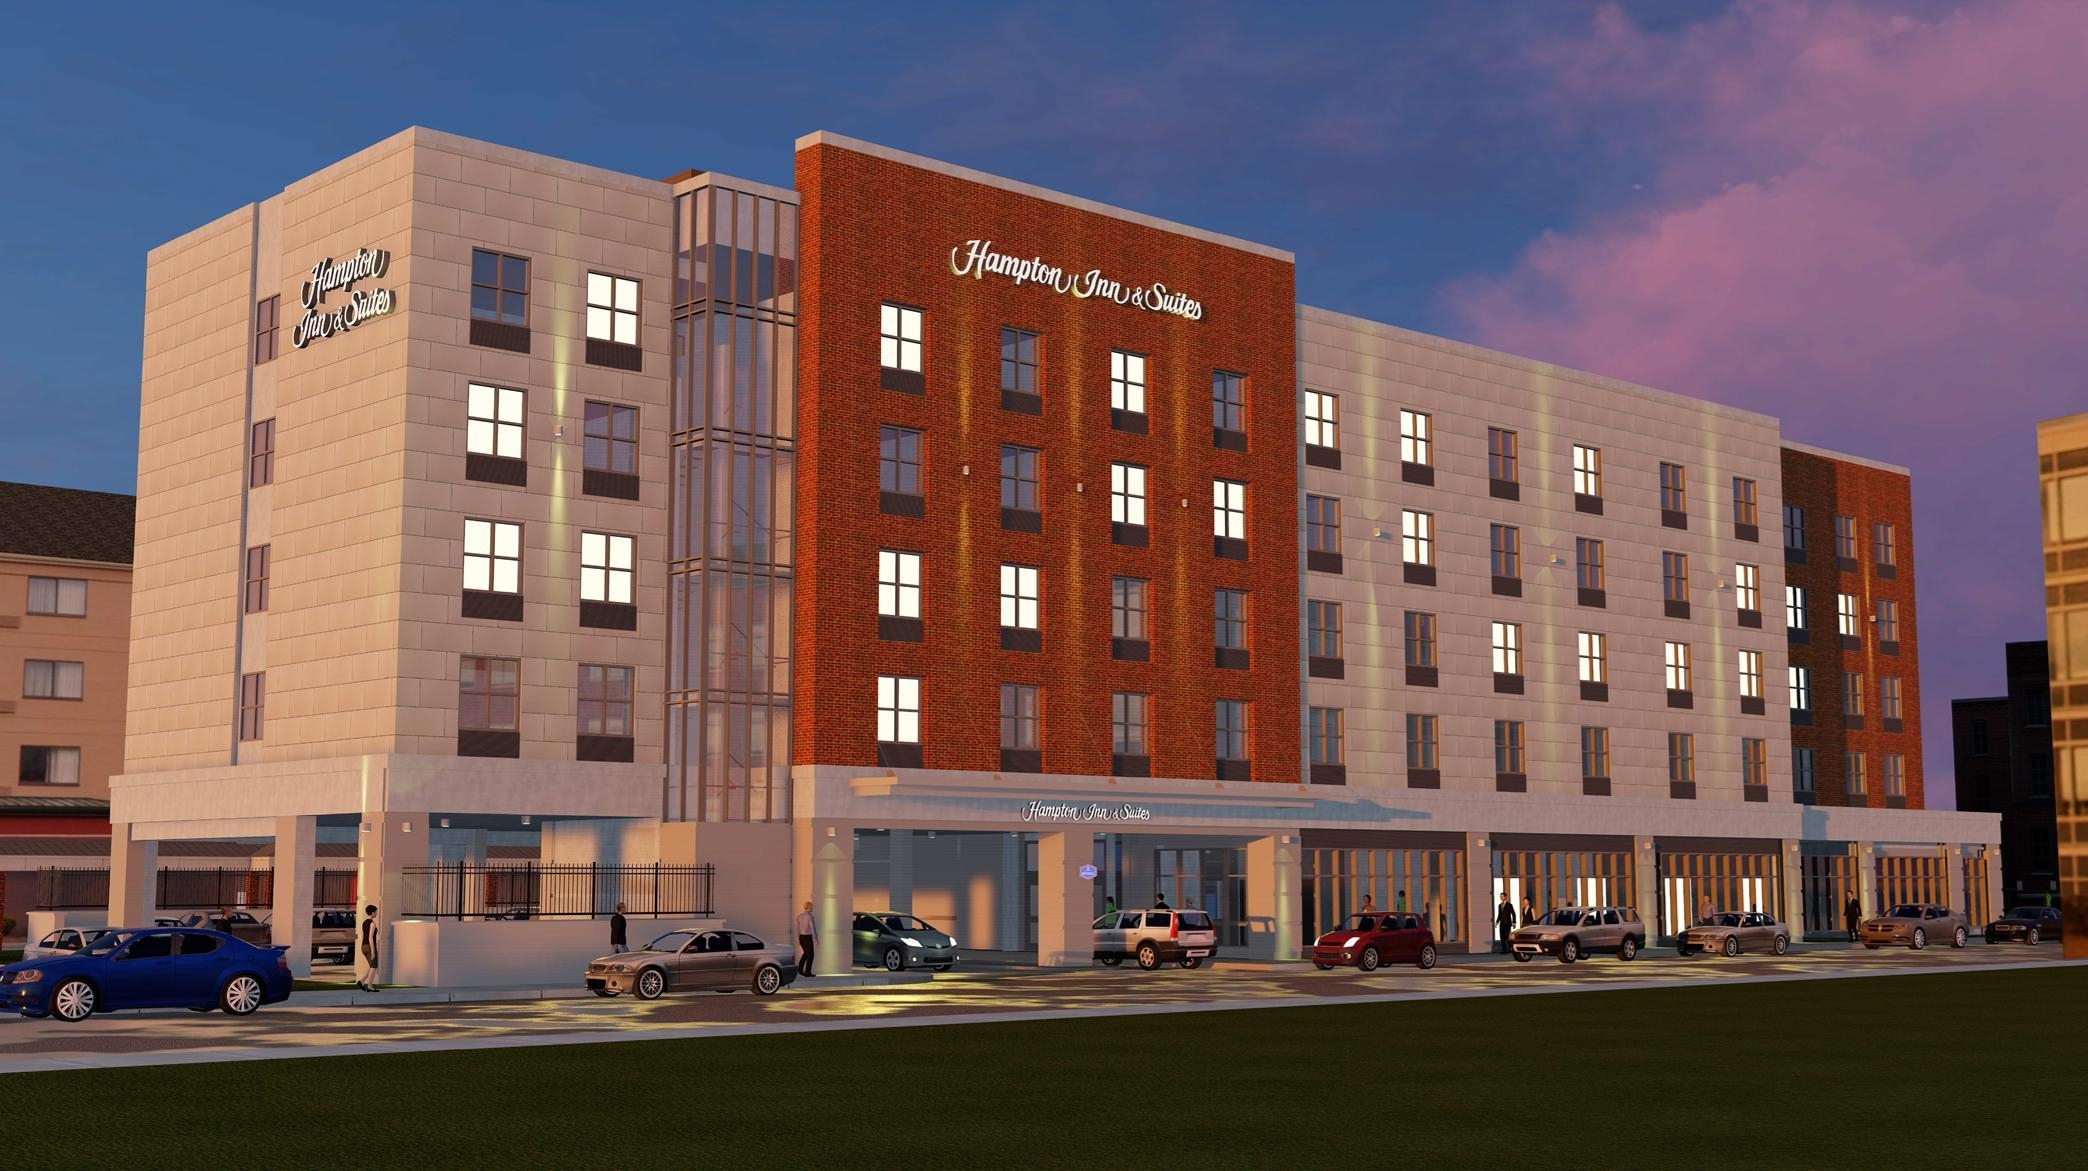 Hampton Inn & Suites Worcester image 0